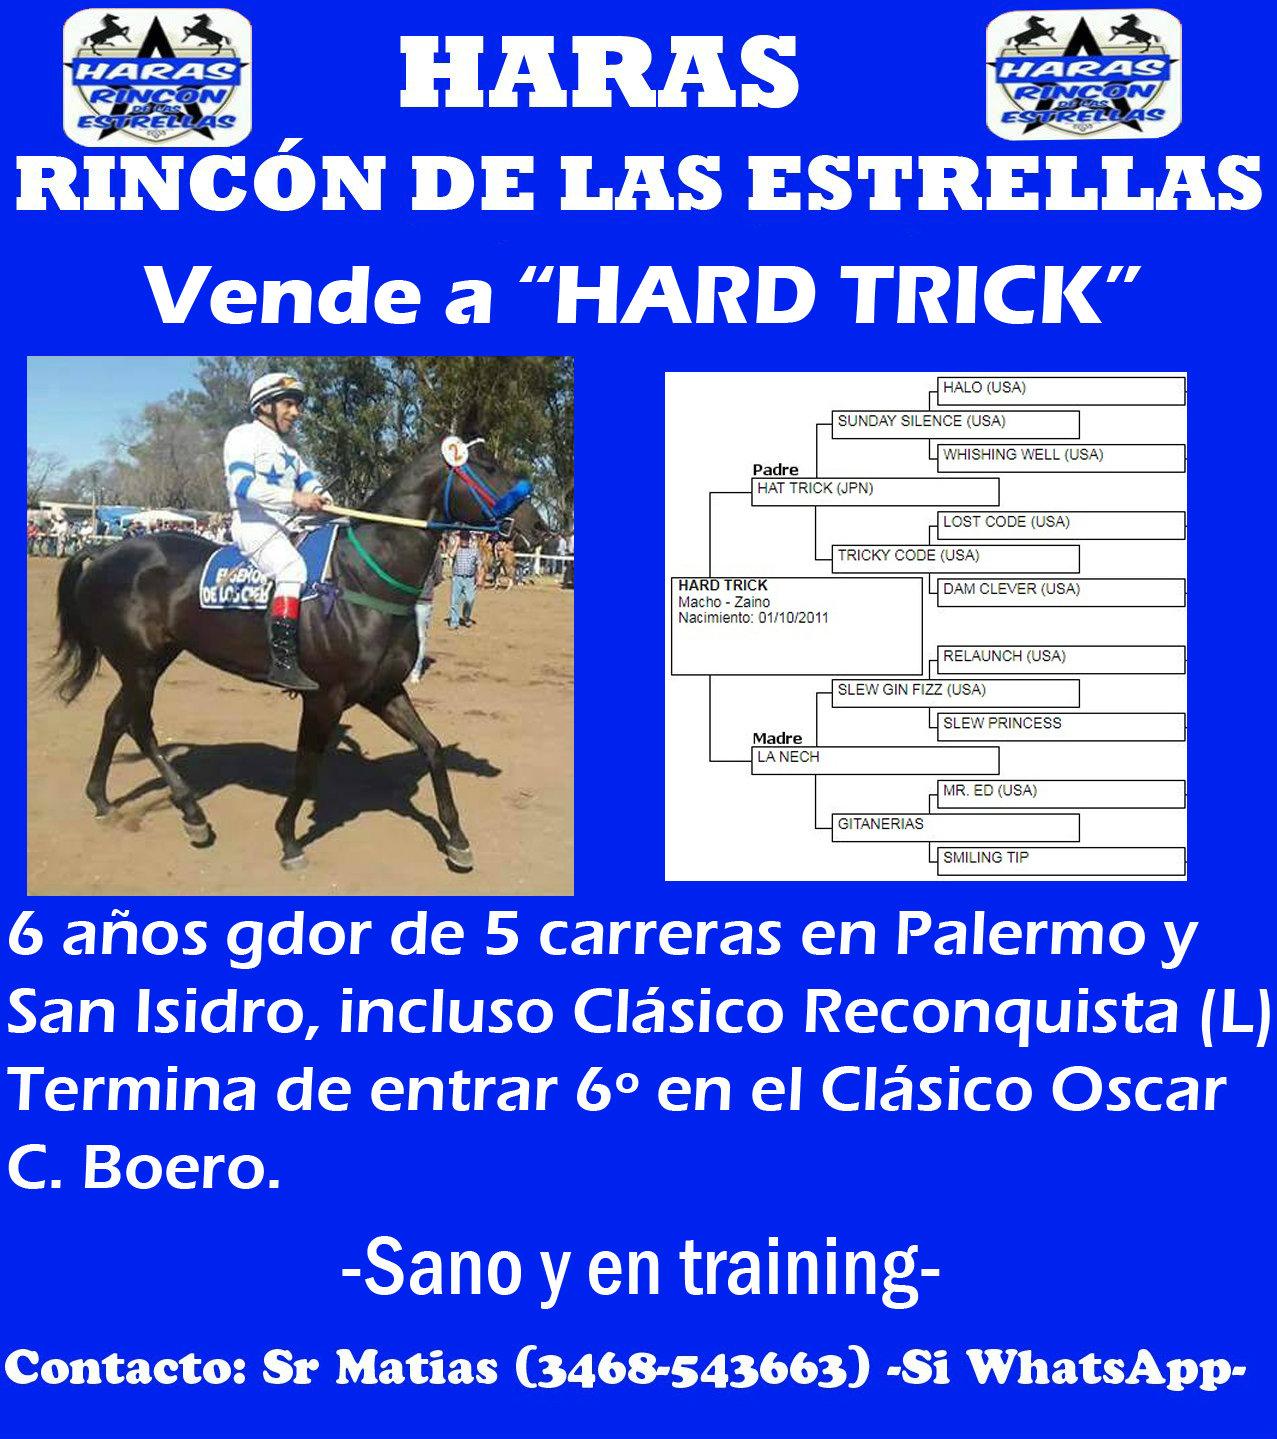 RINC ESTRELLAS HARD TRICK